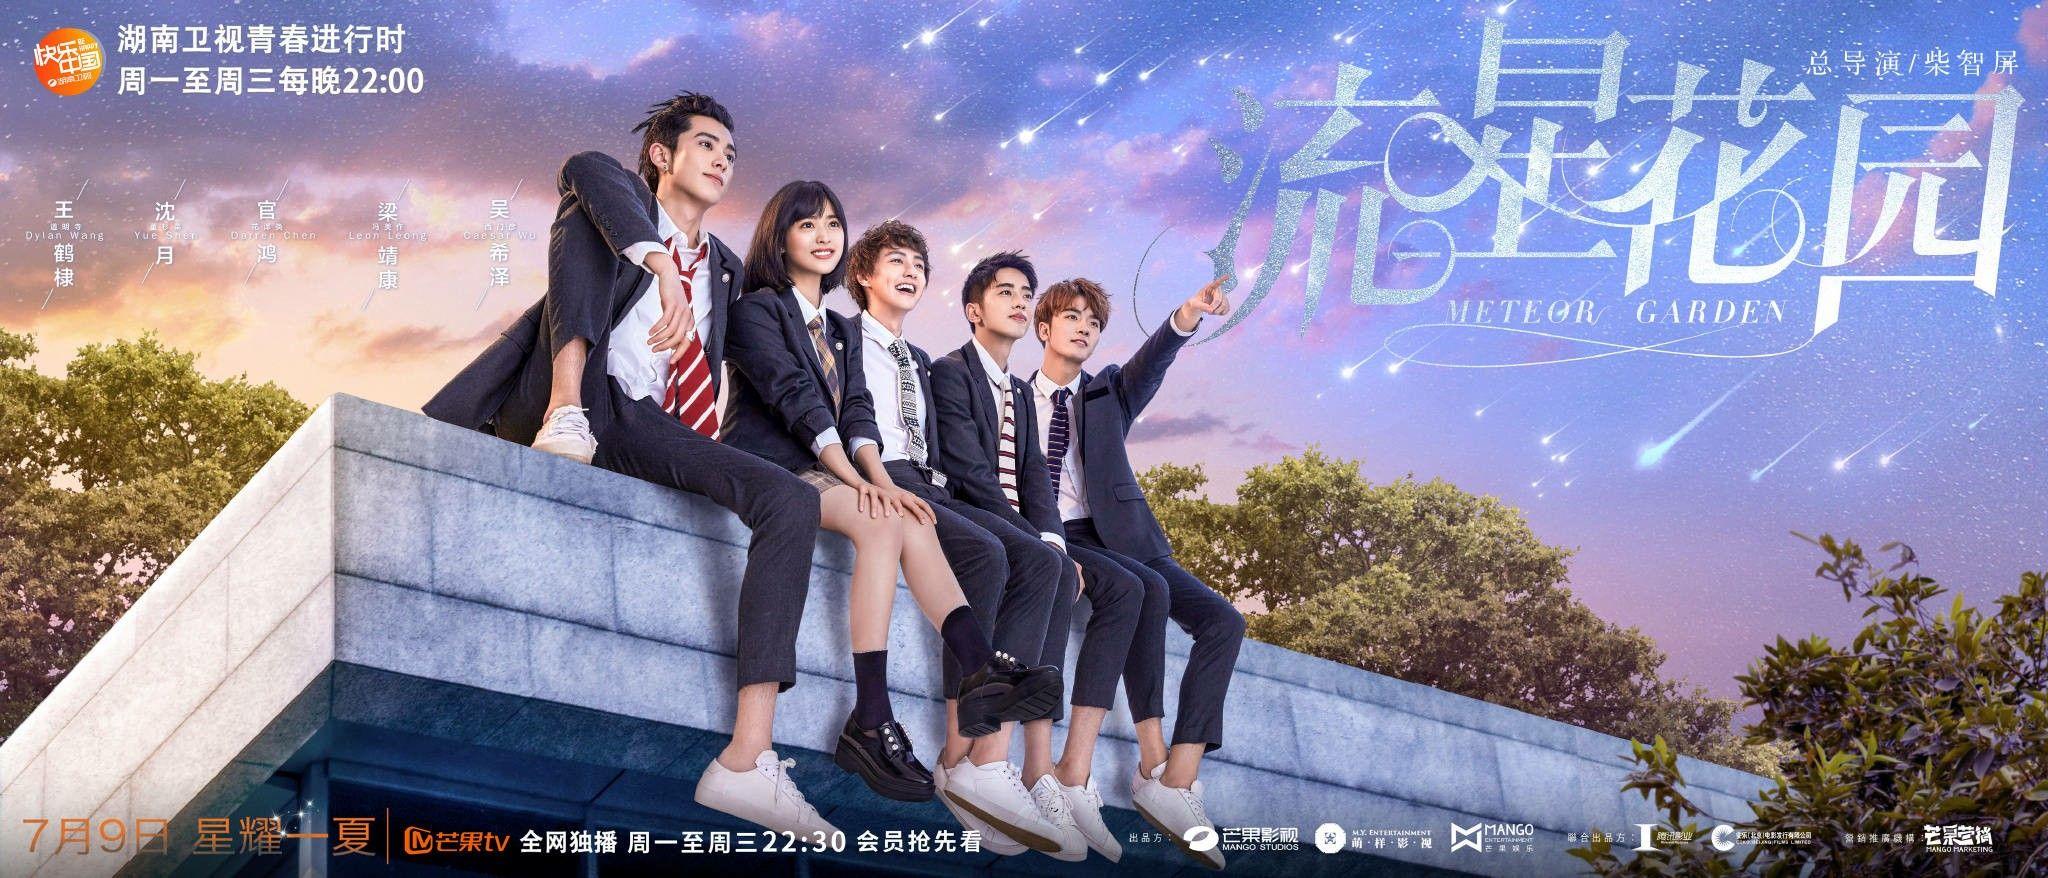 Meteor Garden Dylan Wang Shen Yue Follow Kdramalover 020 On Instagram For More Meteor Garden Meteor Meteor Garden 2018